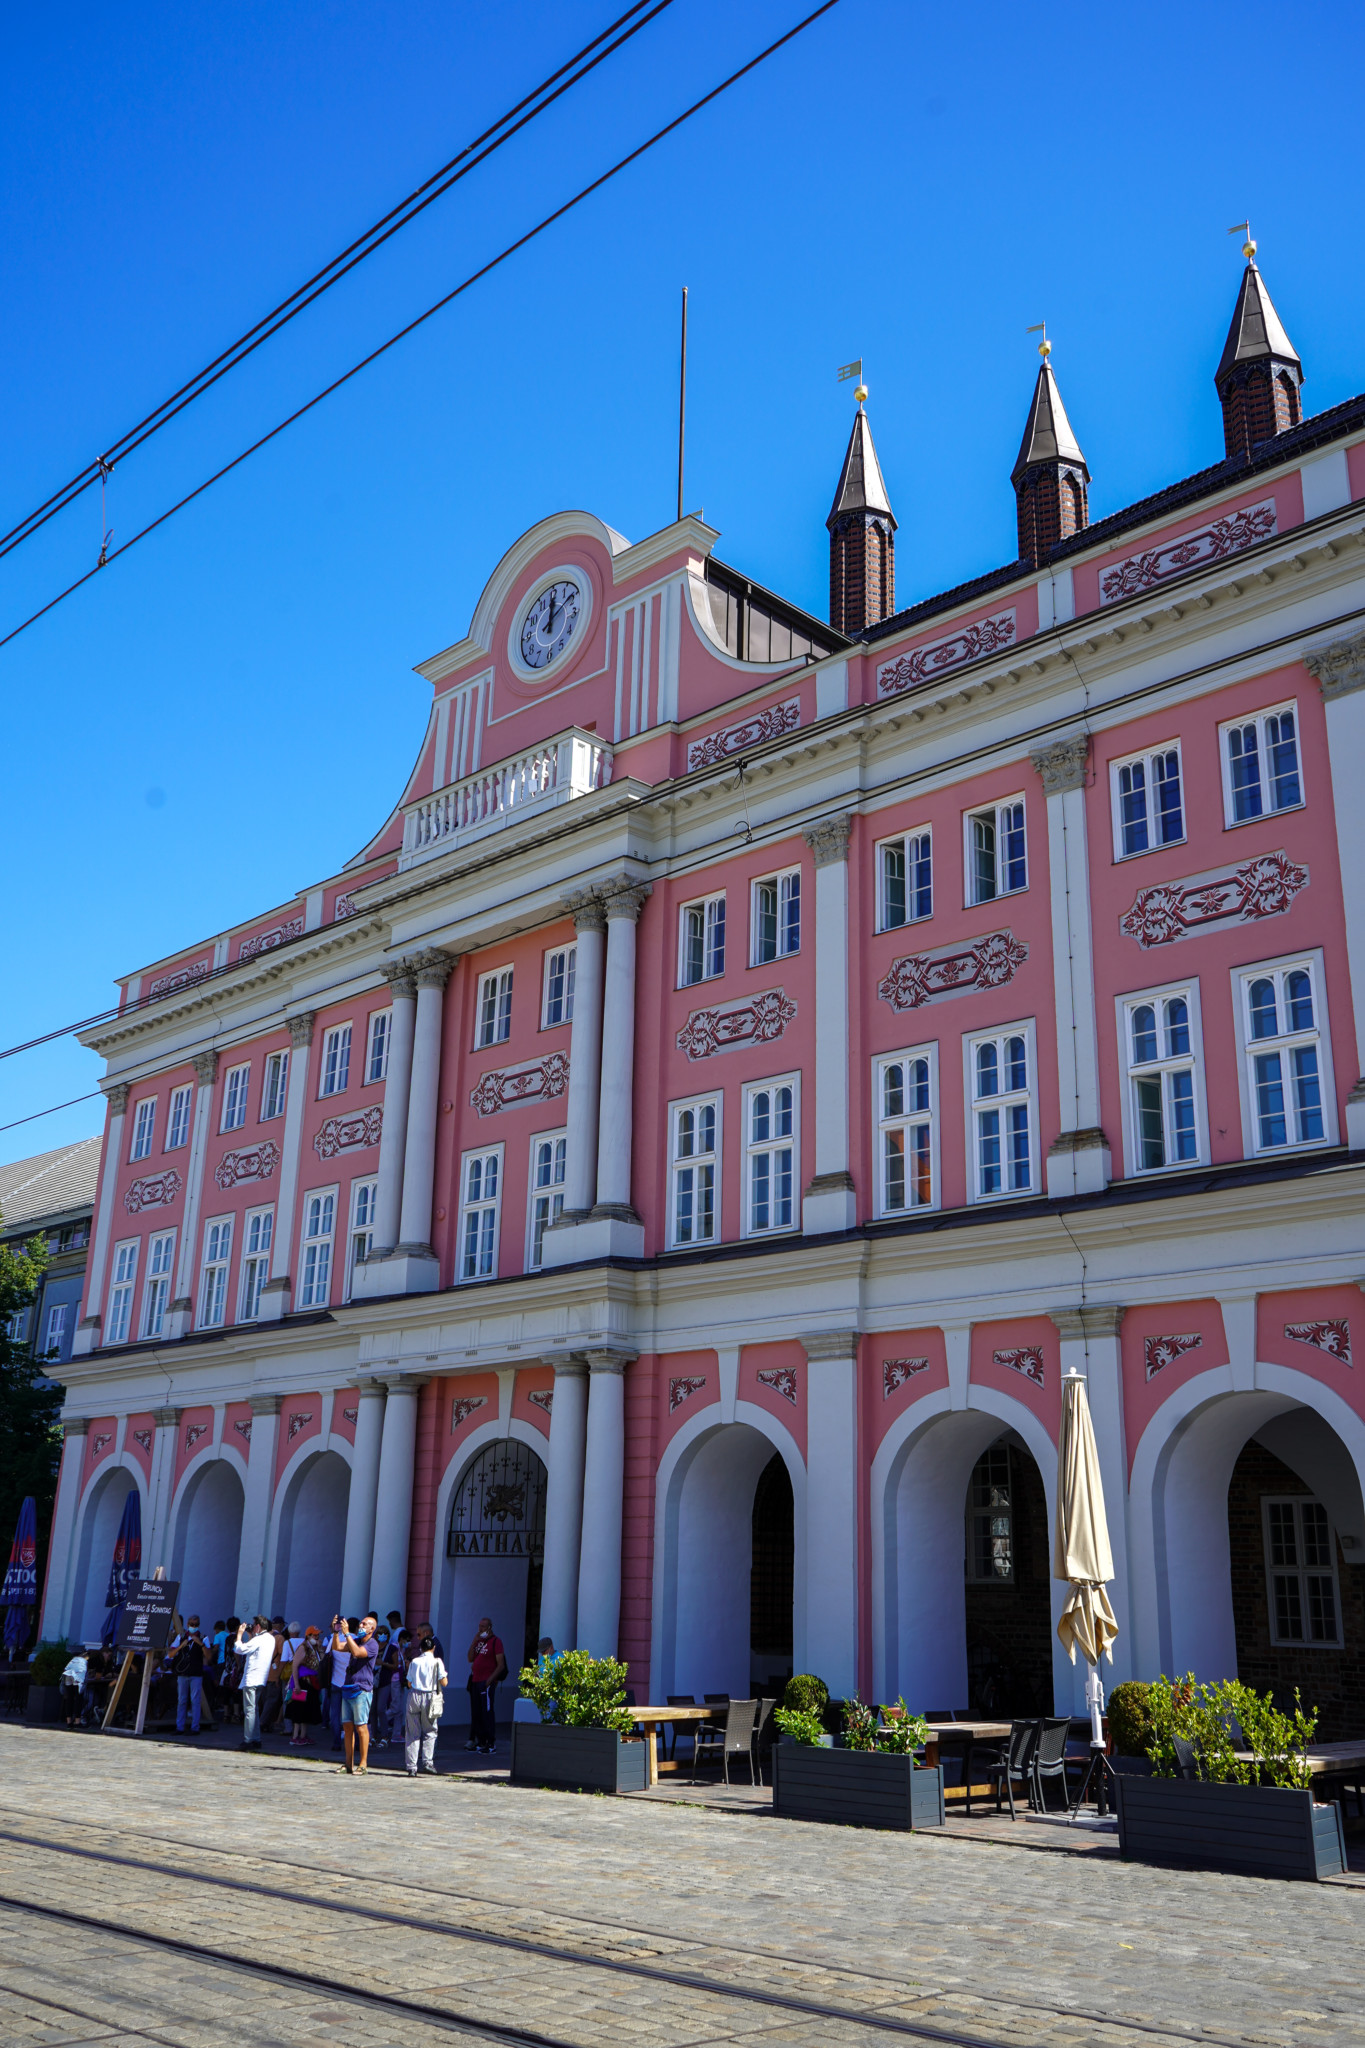 Rostocks Rathaus